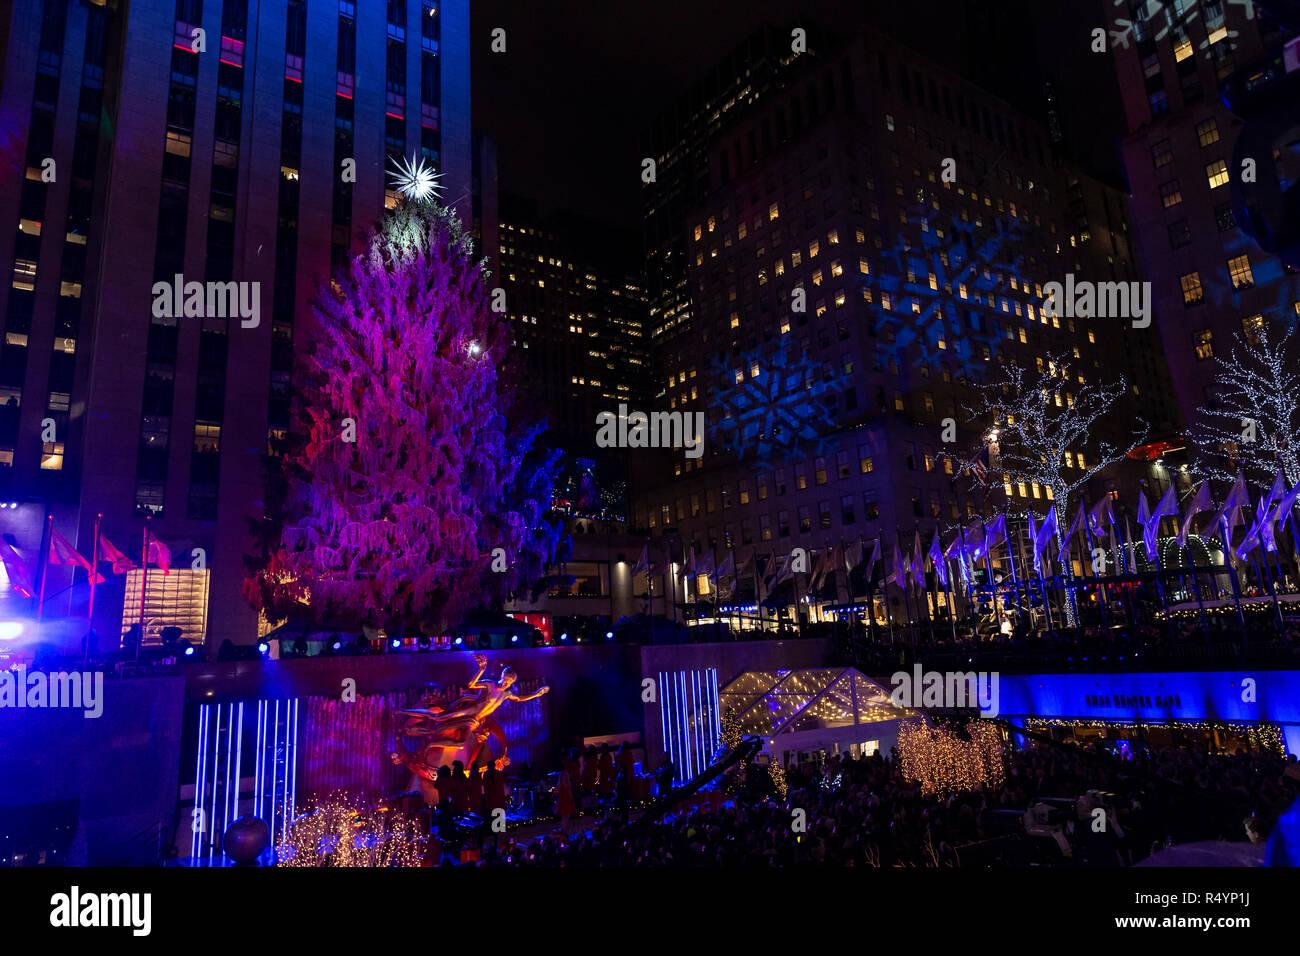 Rockefeller Center Christmas Tree Lighting Ceremony Stock Photos ...